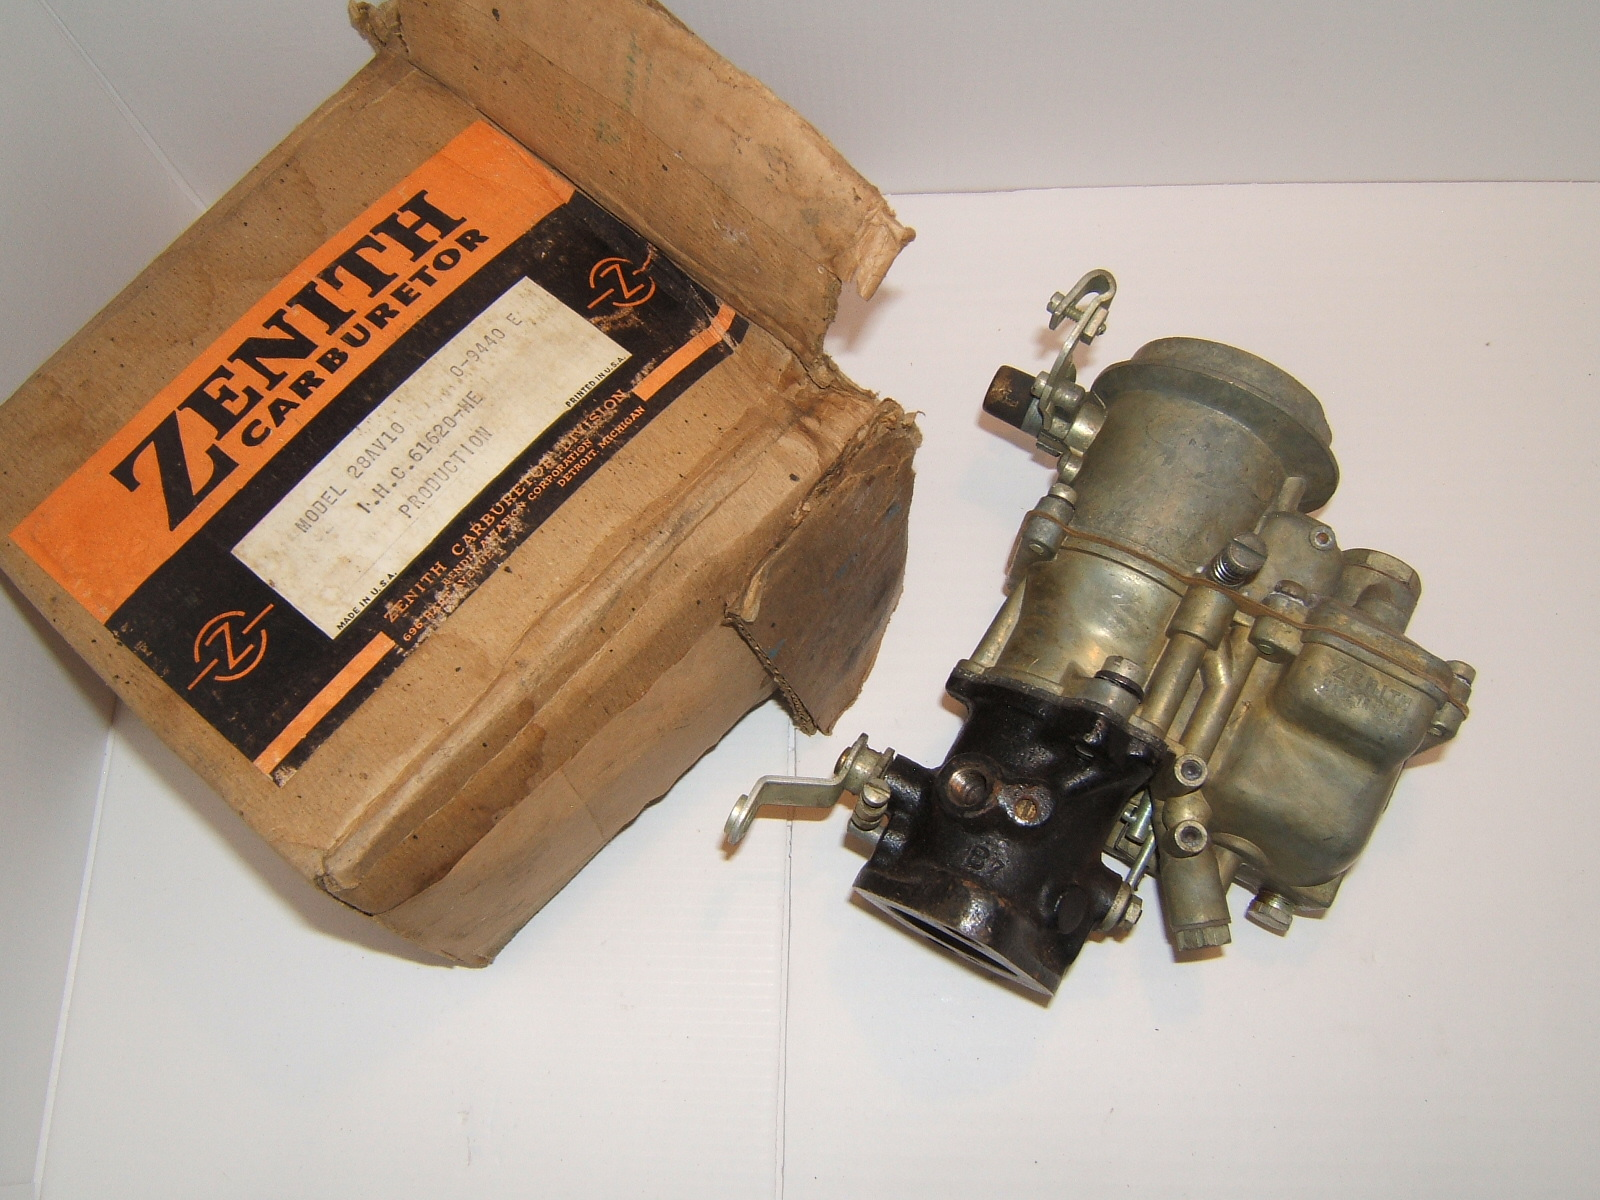 1937-40 International truck nos zenith 28AV10 (a 28AV10)